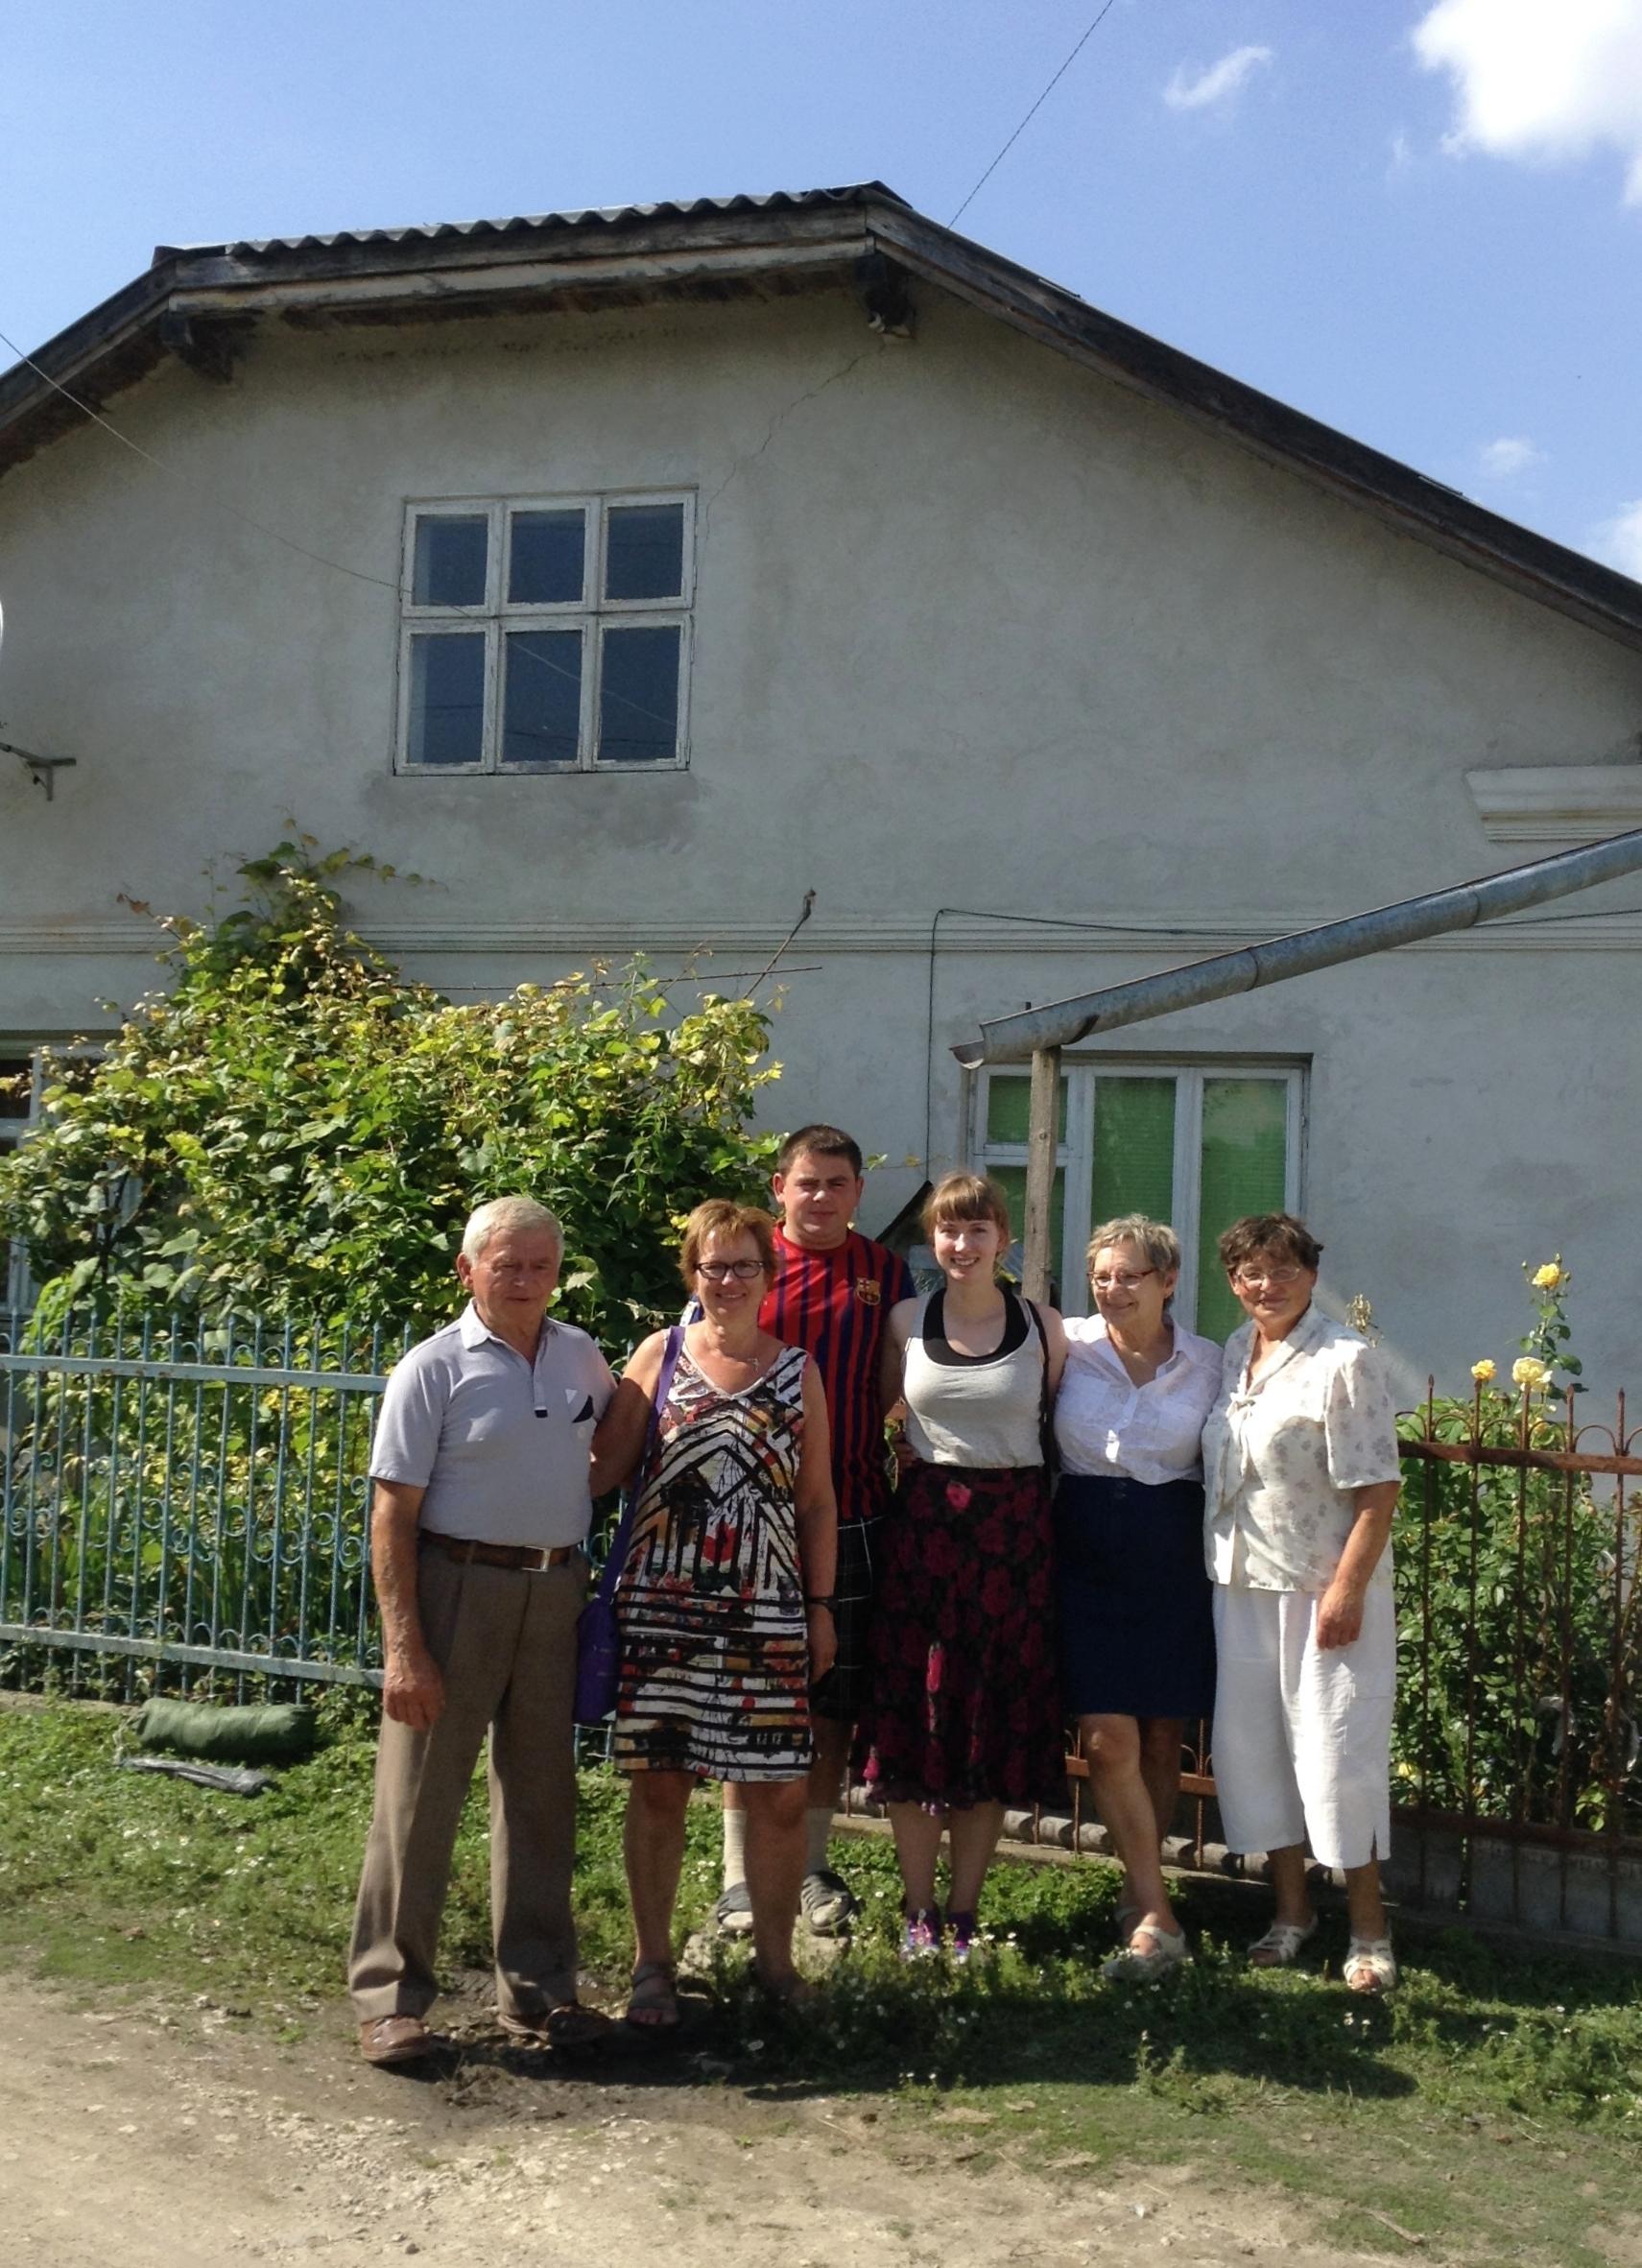 Mykhailo, my mom, Ivan, me, my mom's cousin Shirley, and Hanna.